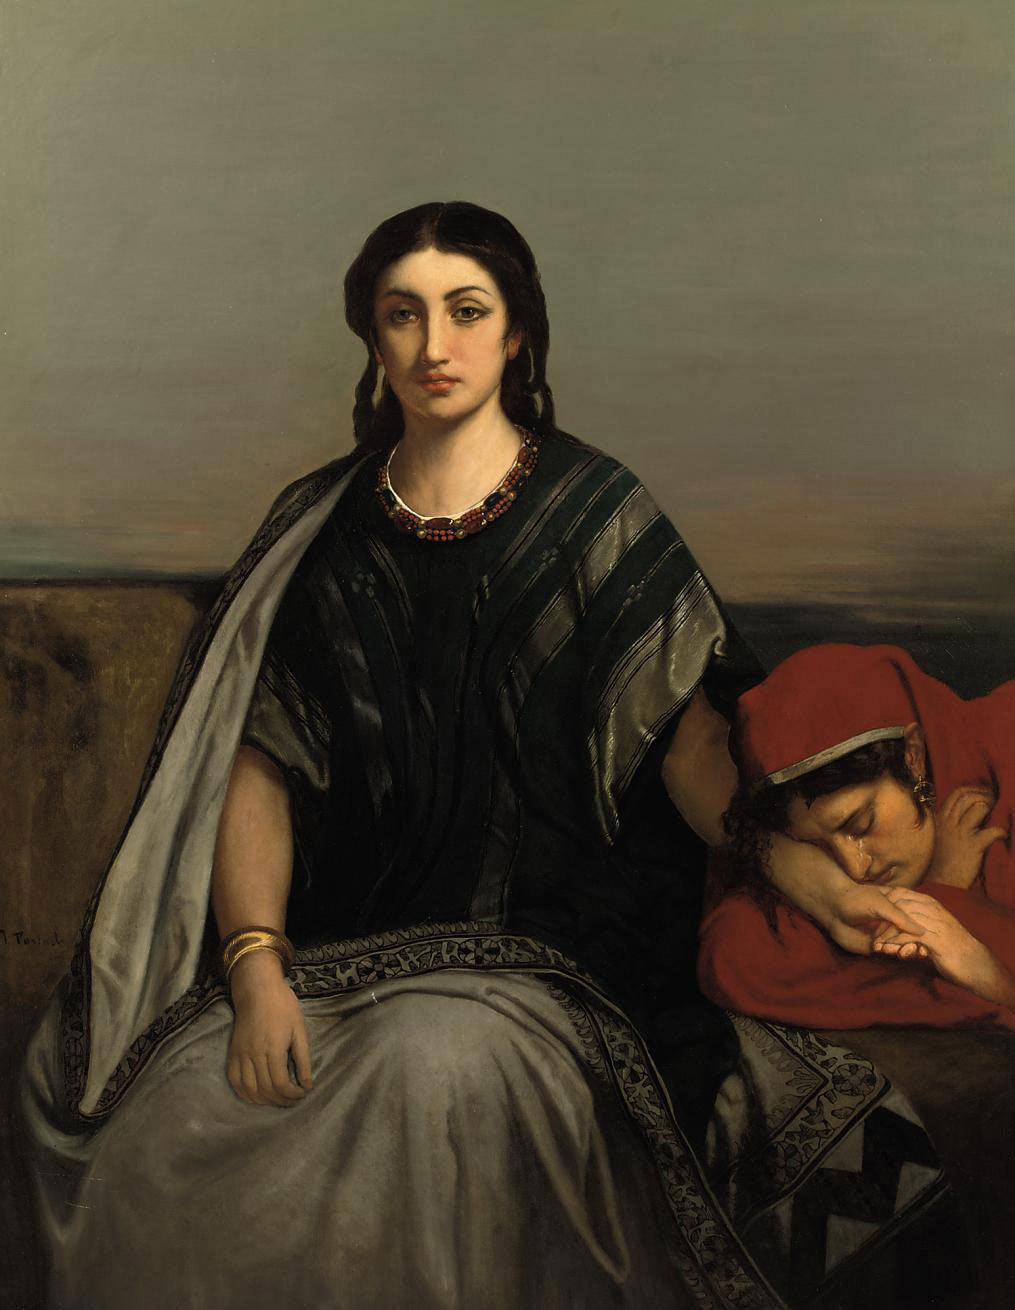 Jephta's daughter